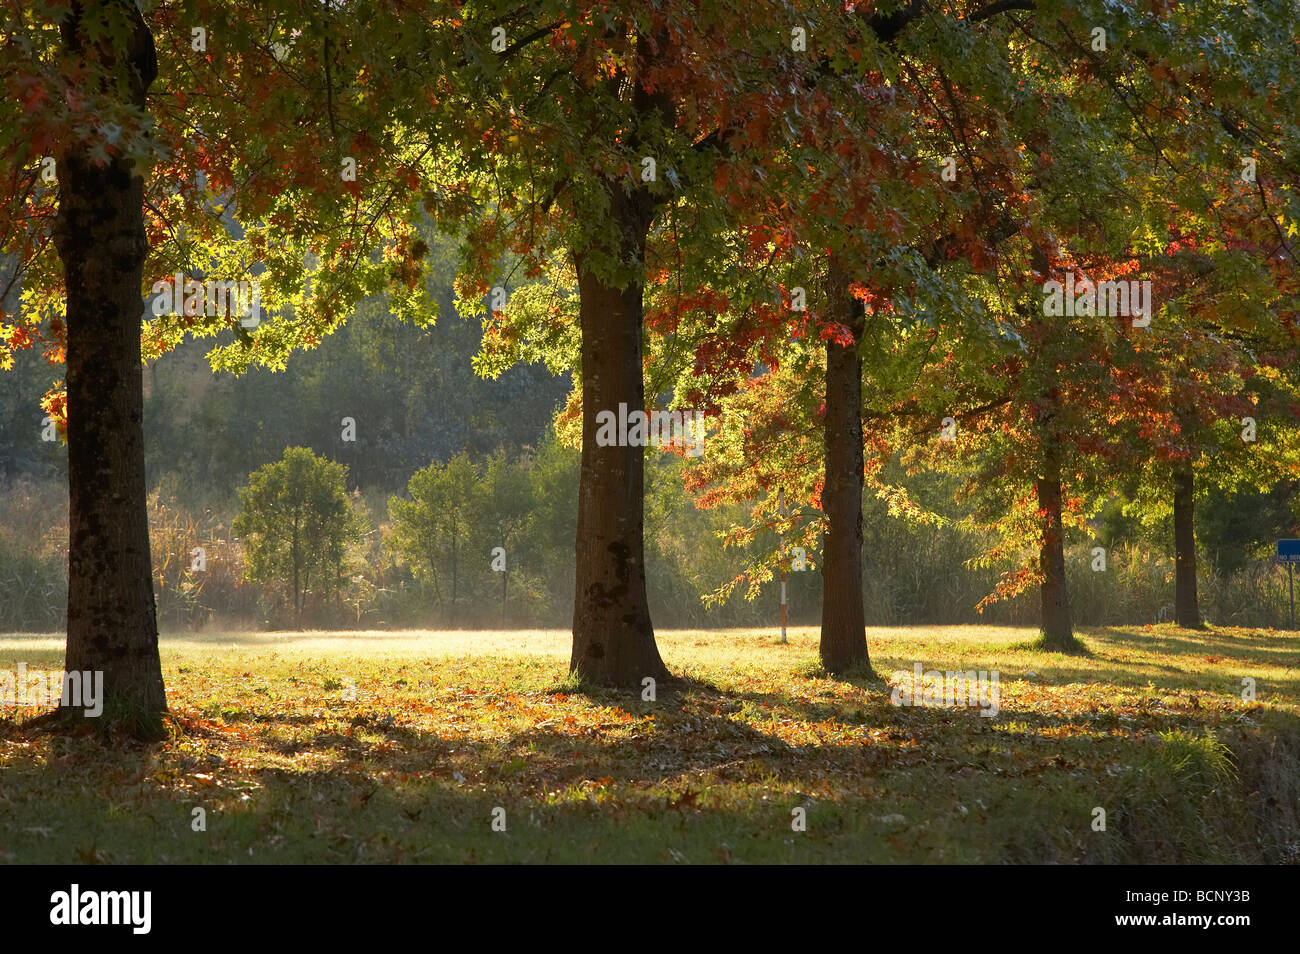 Autumn Trees Khancoban Snowy Mountains Southern New South Wales Australia - Stock Image